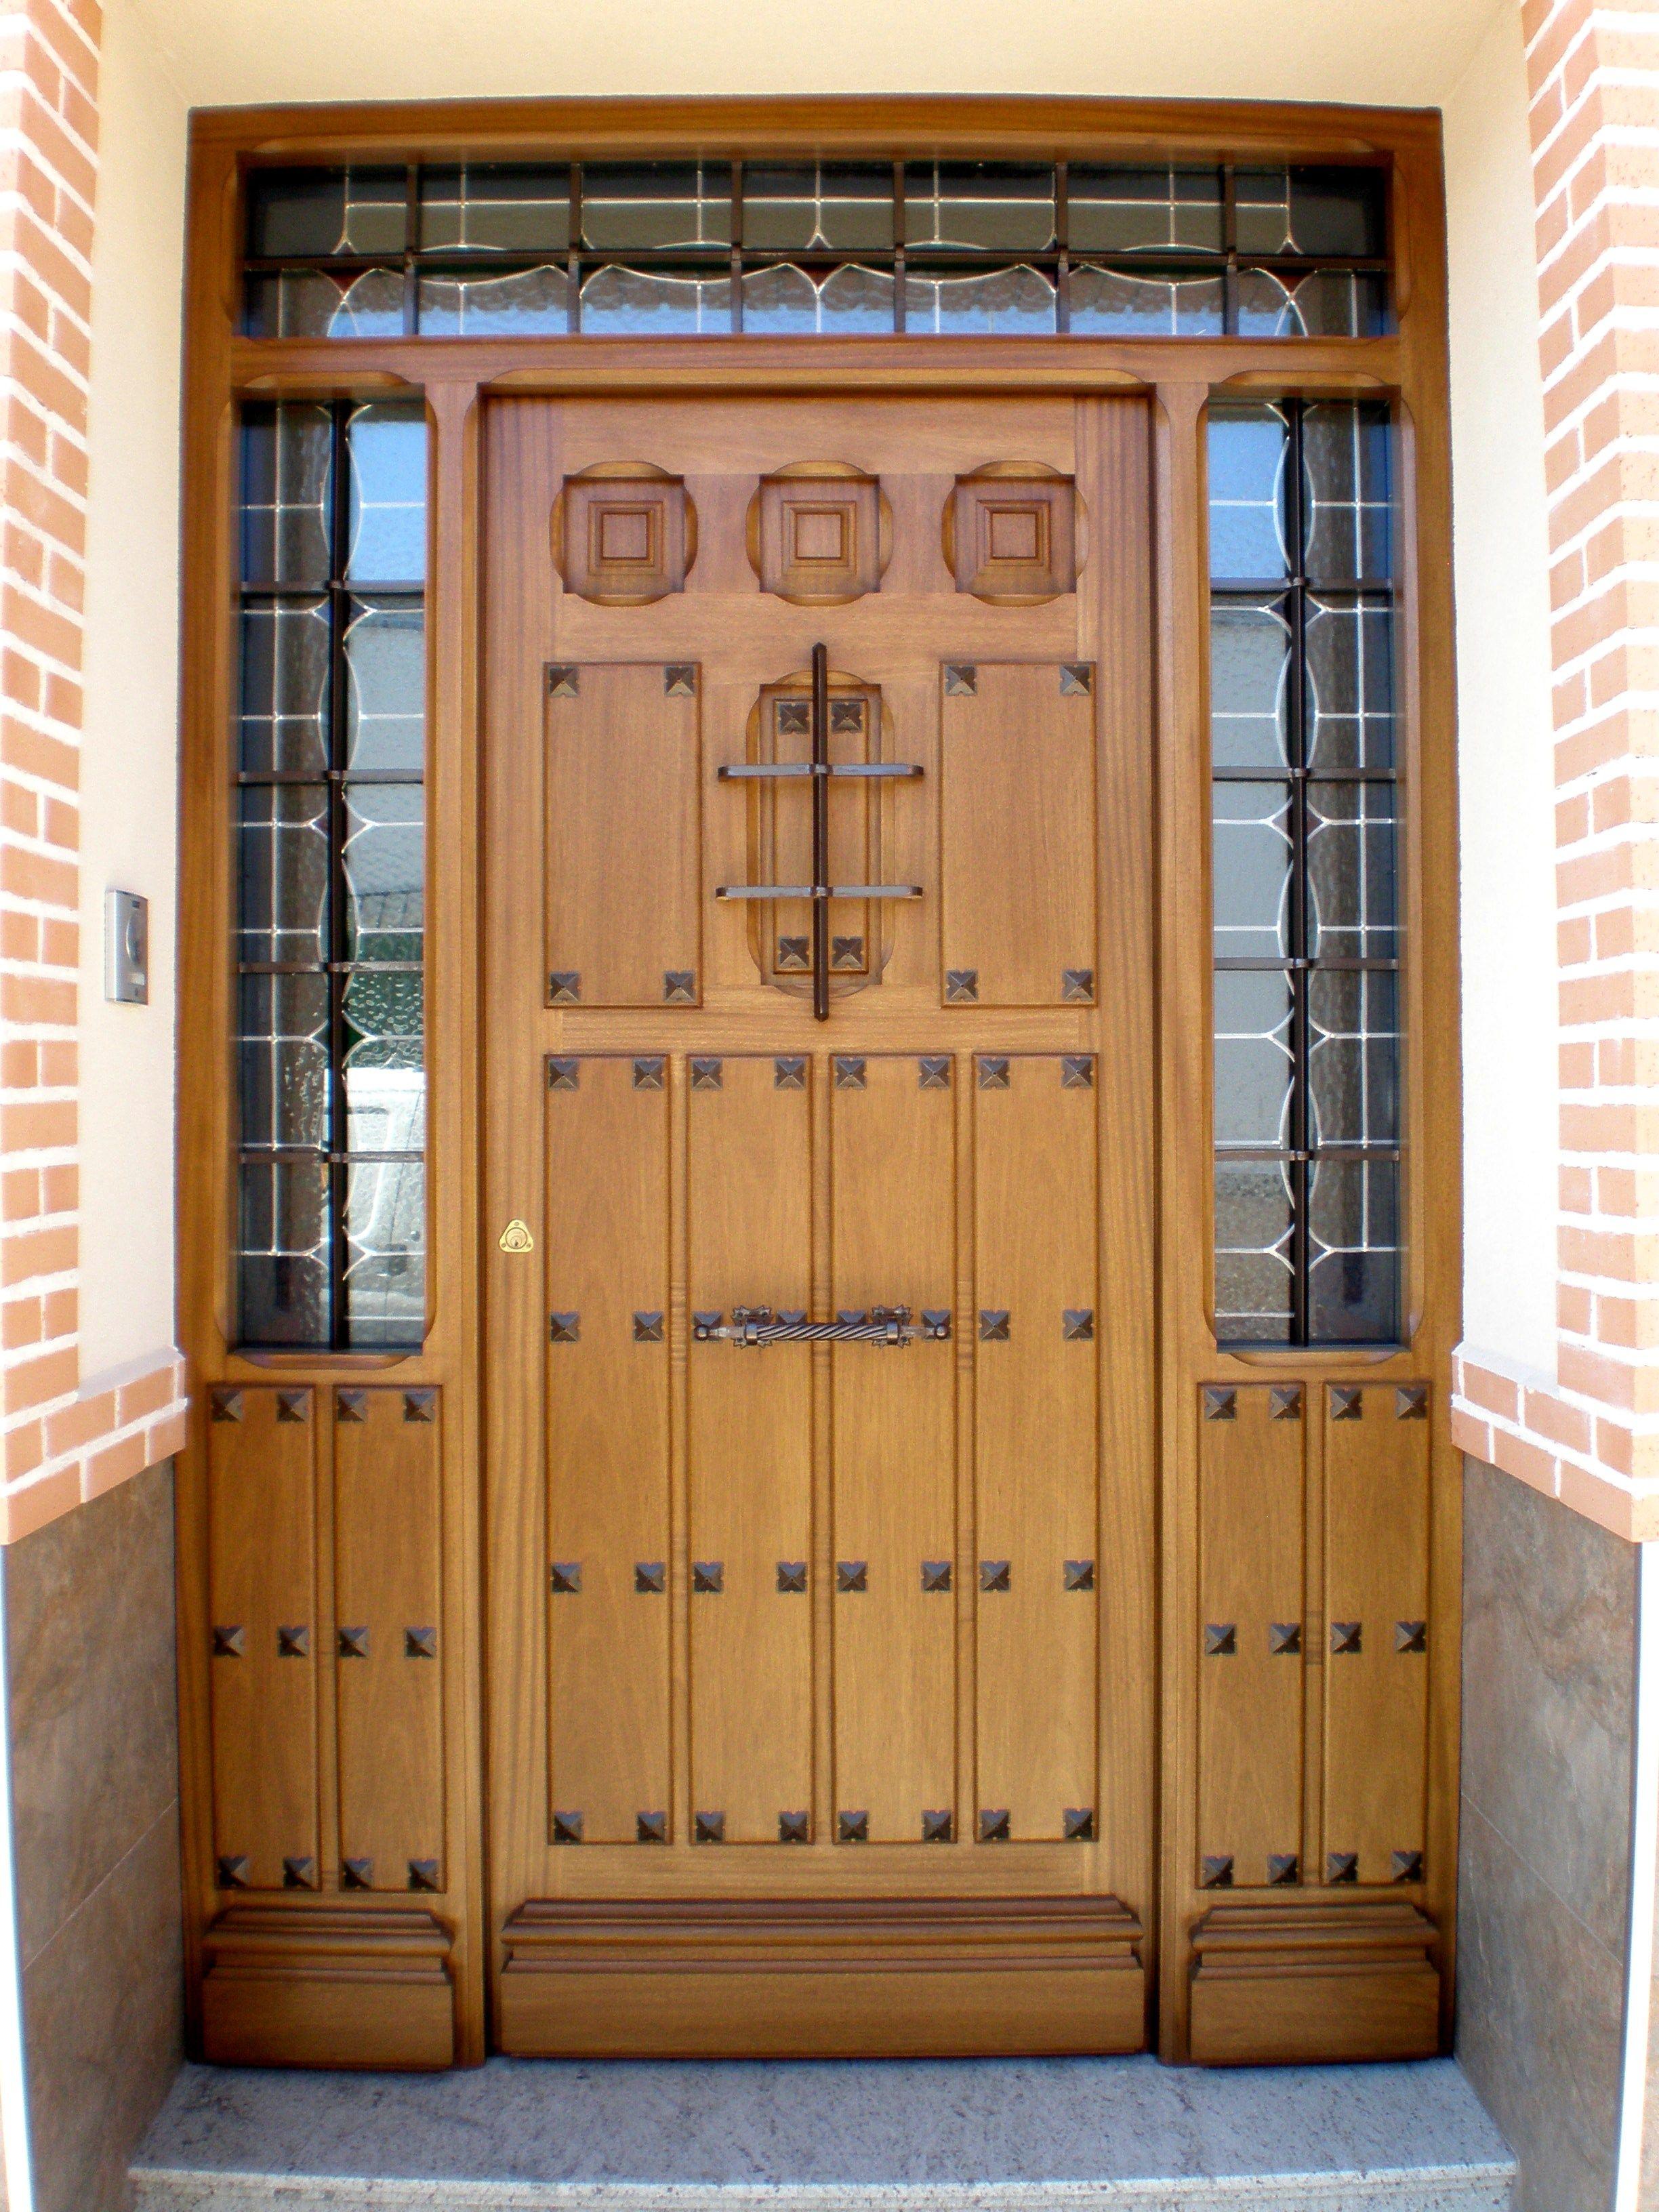 Dise o de puerta rustica ideal para casa rural - Puertas rusticas de madera ...